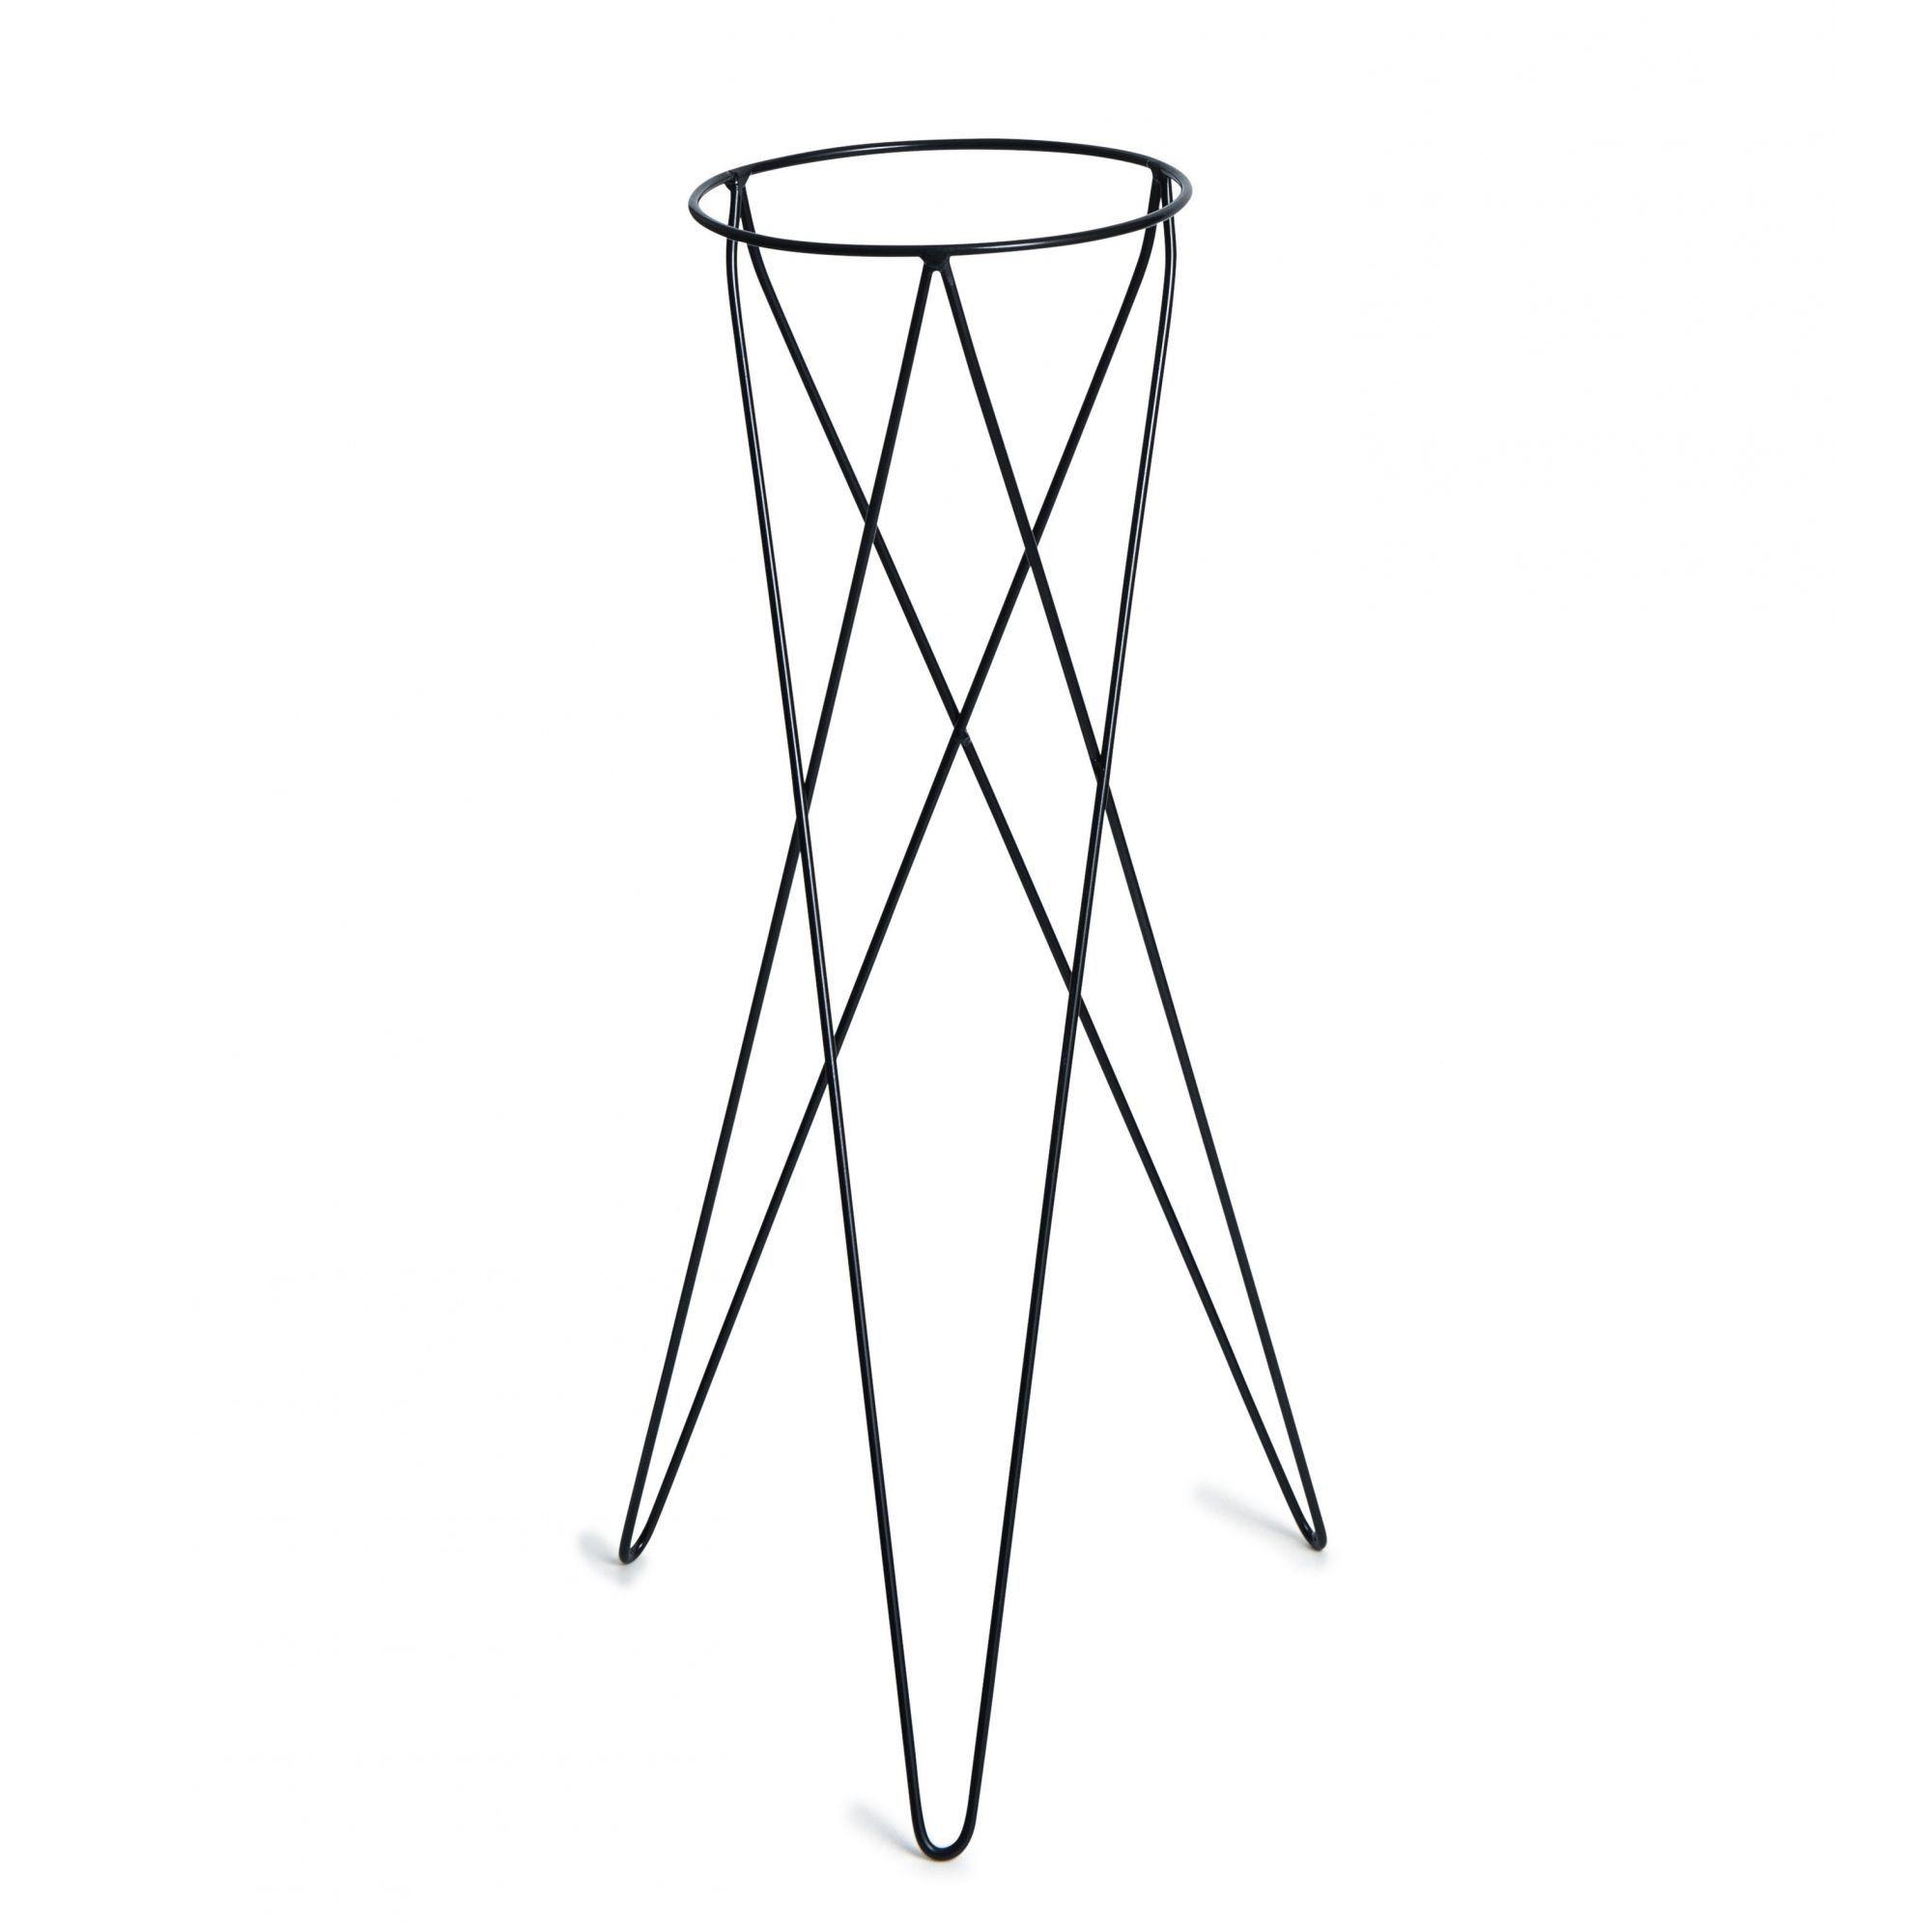 Suporte Tripé Metálico Preto 80cm para Vaso Autoirrigável Grande N04 Raiz